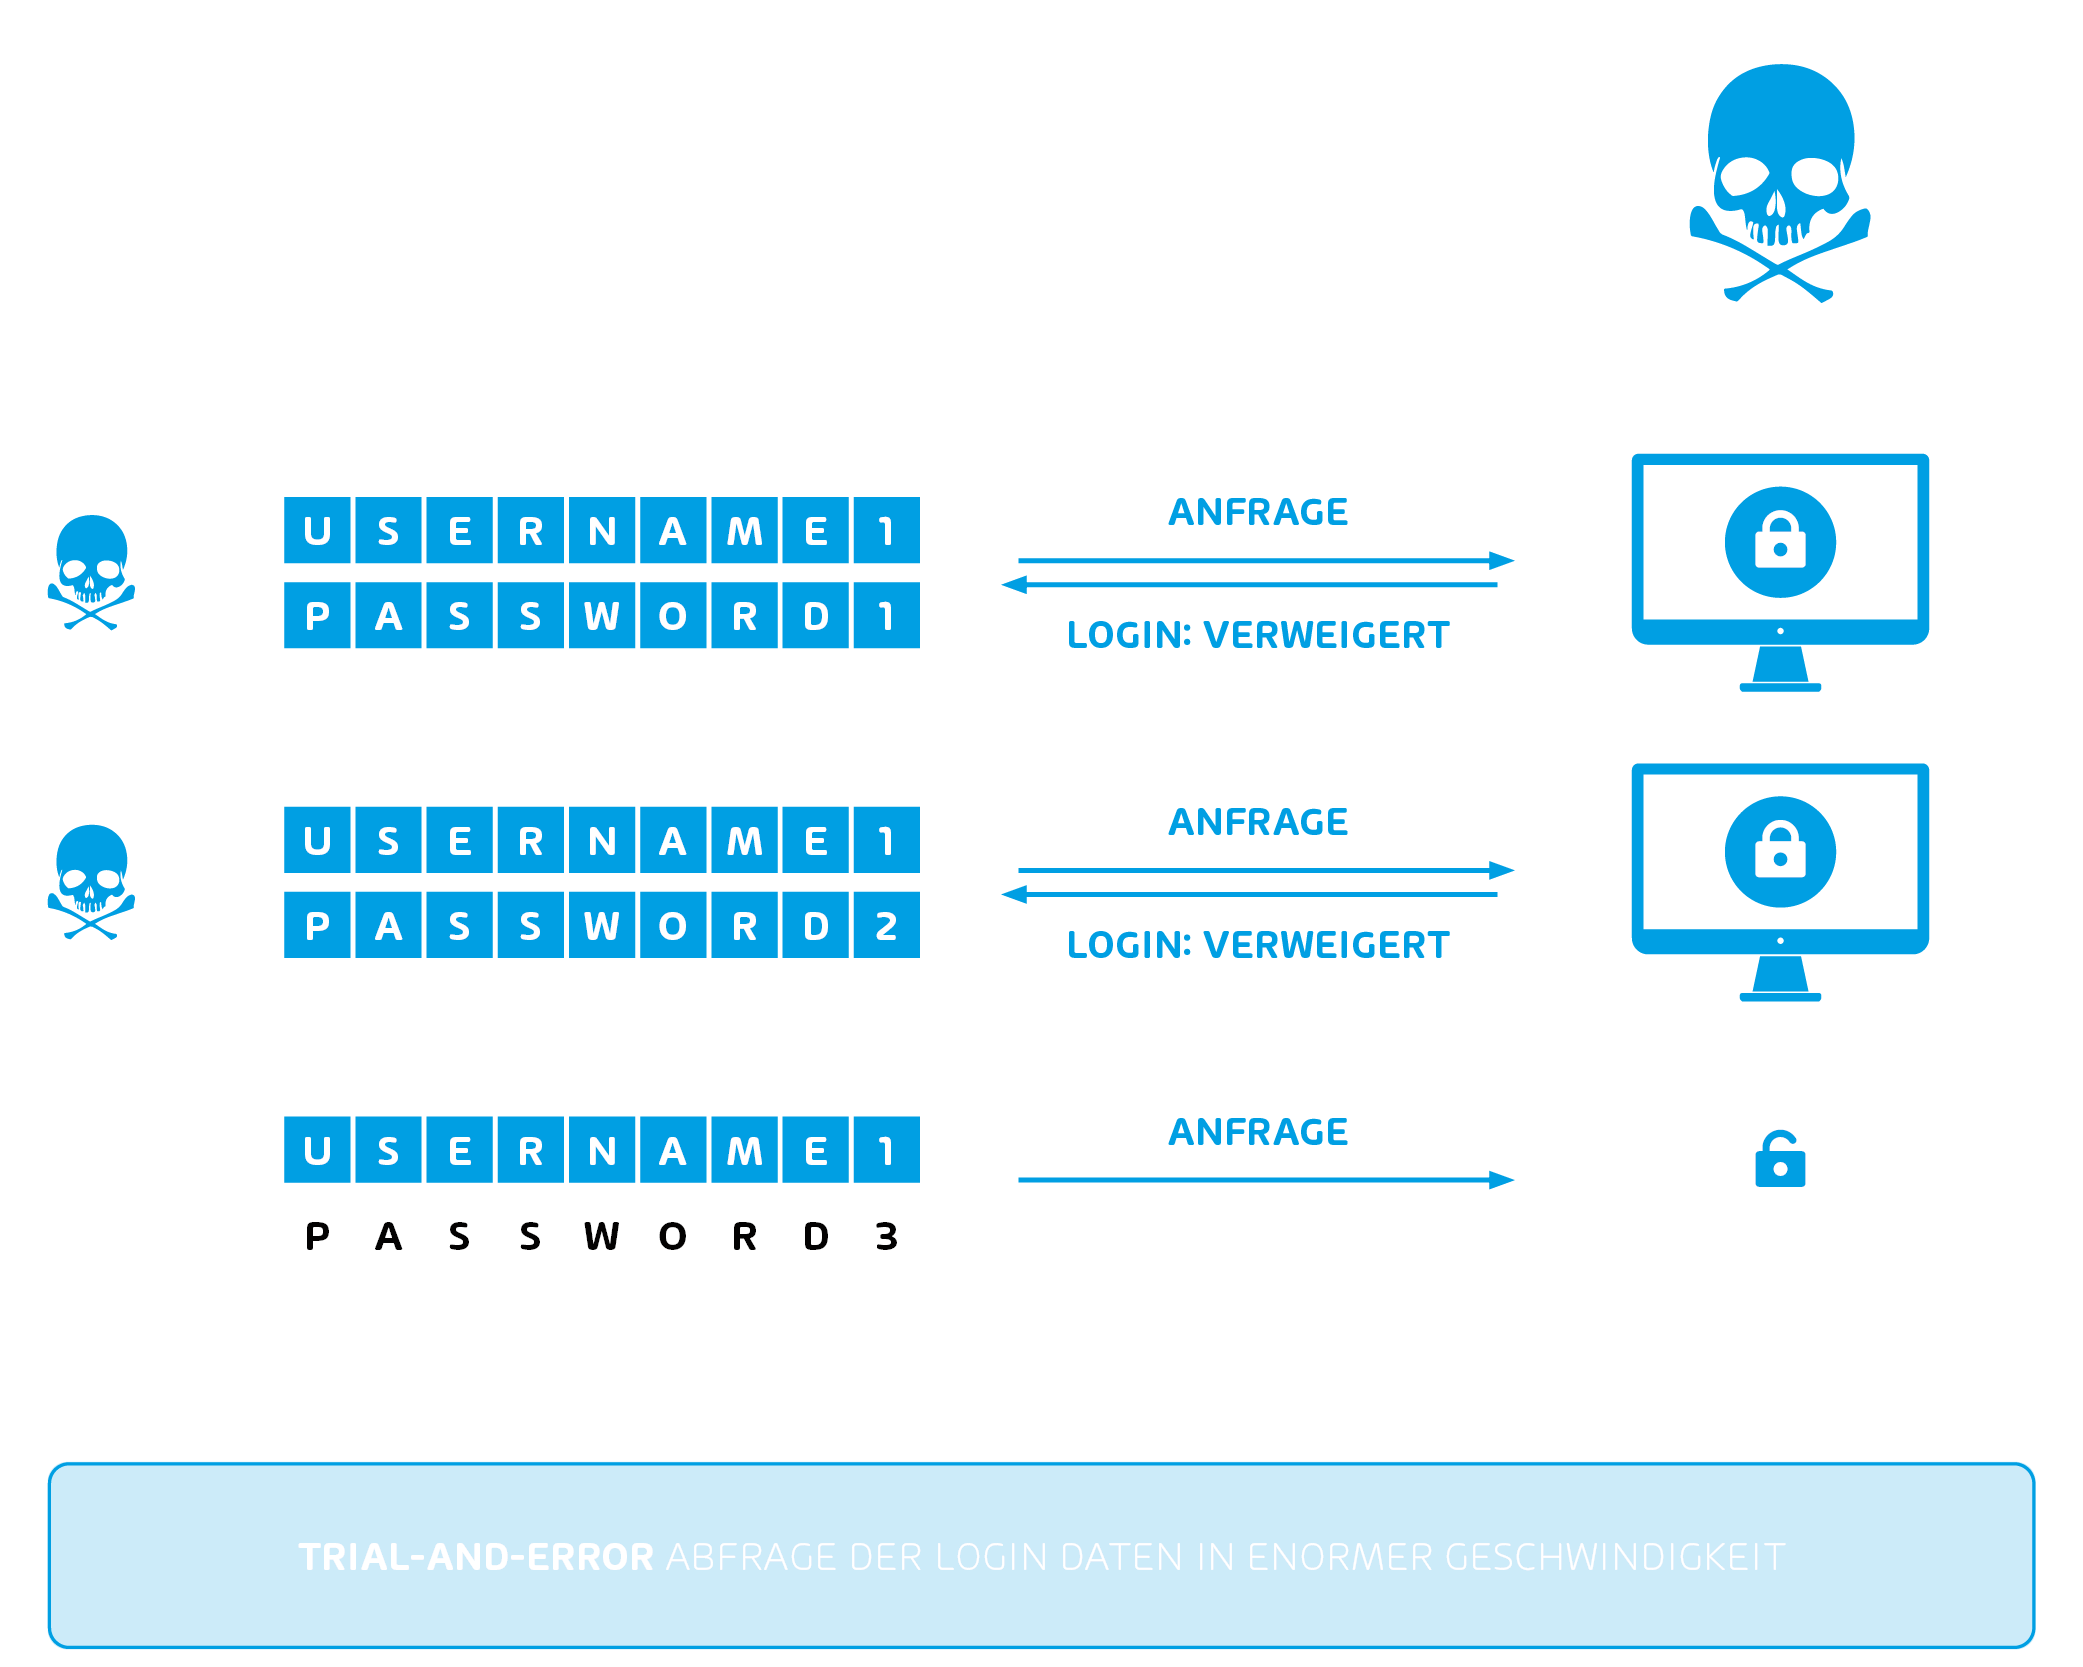 Brute-Force-Attacken erklärt